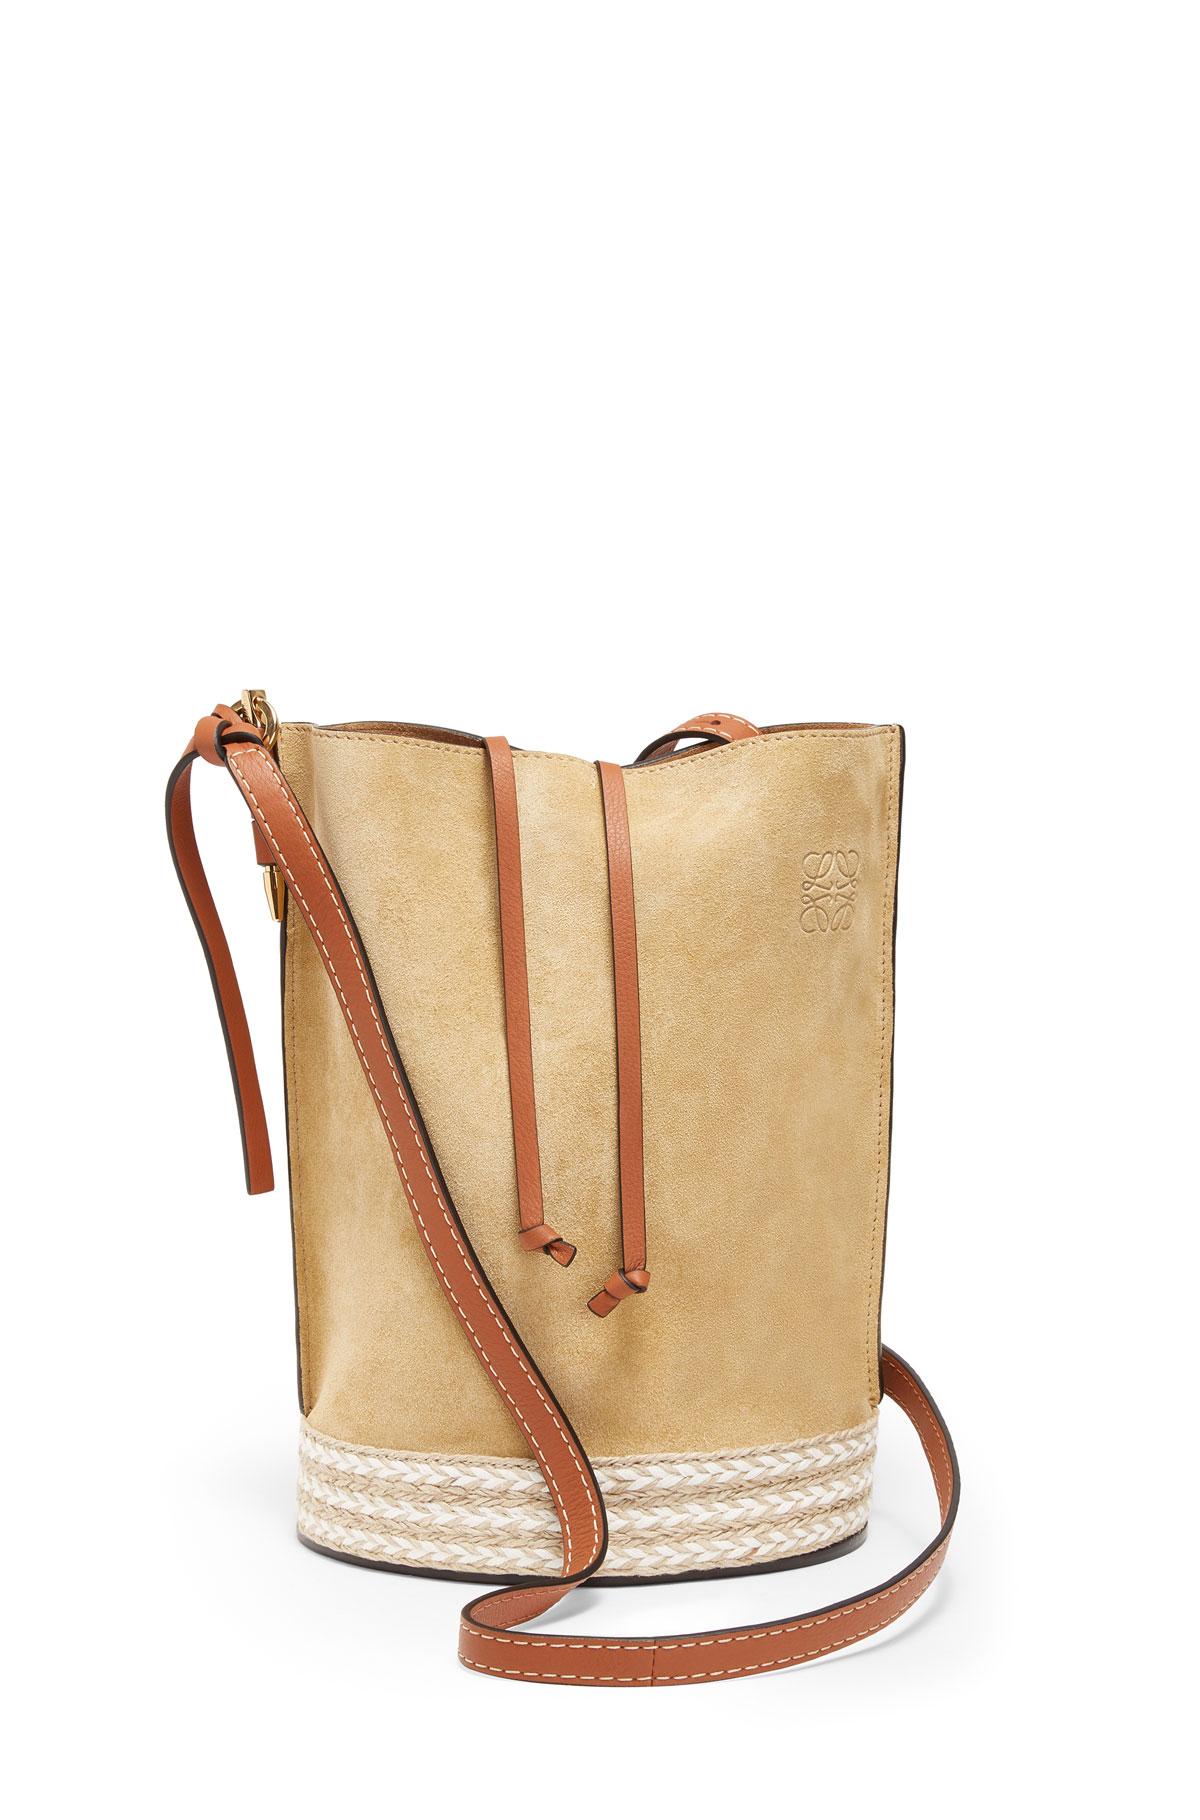 LOEWE Gate Bucket Espadrillas Bag Gold front